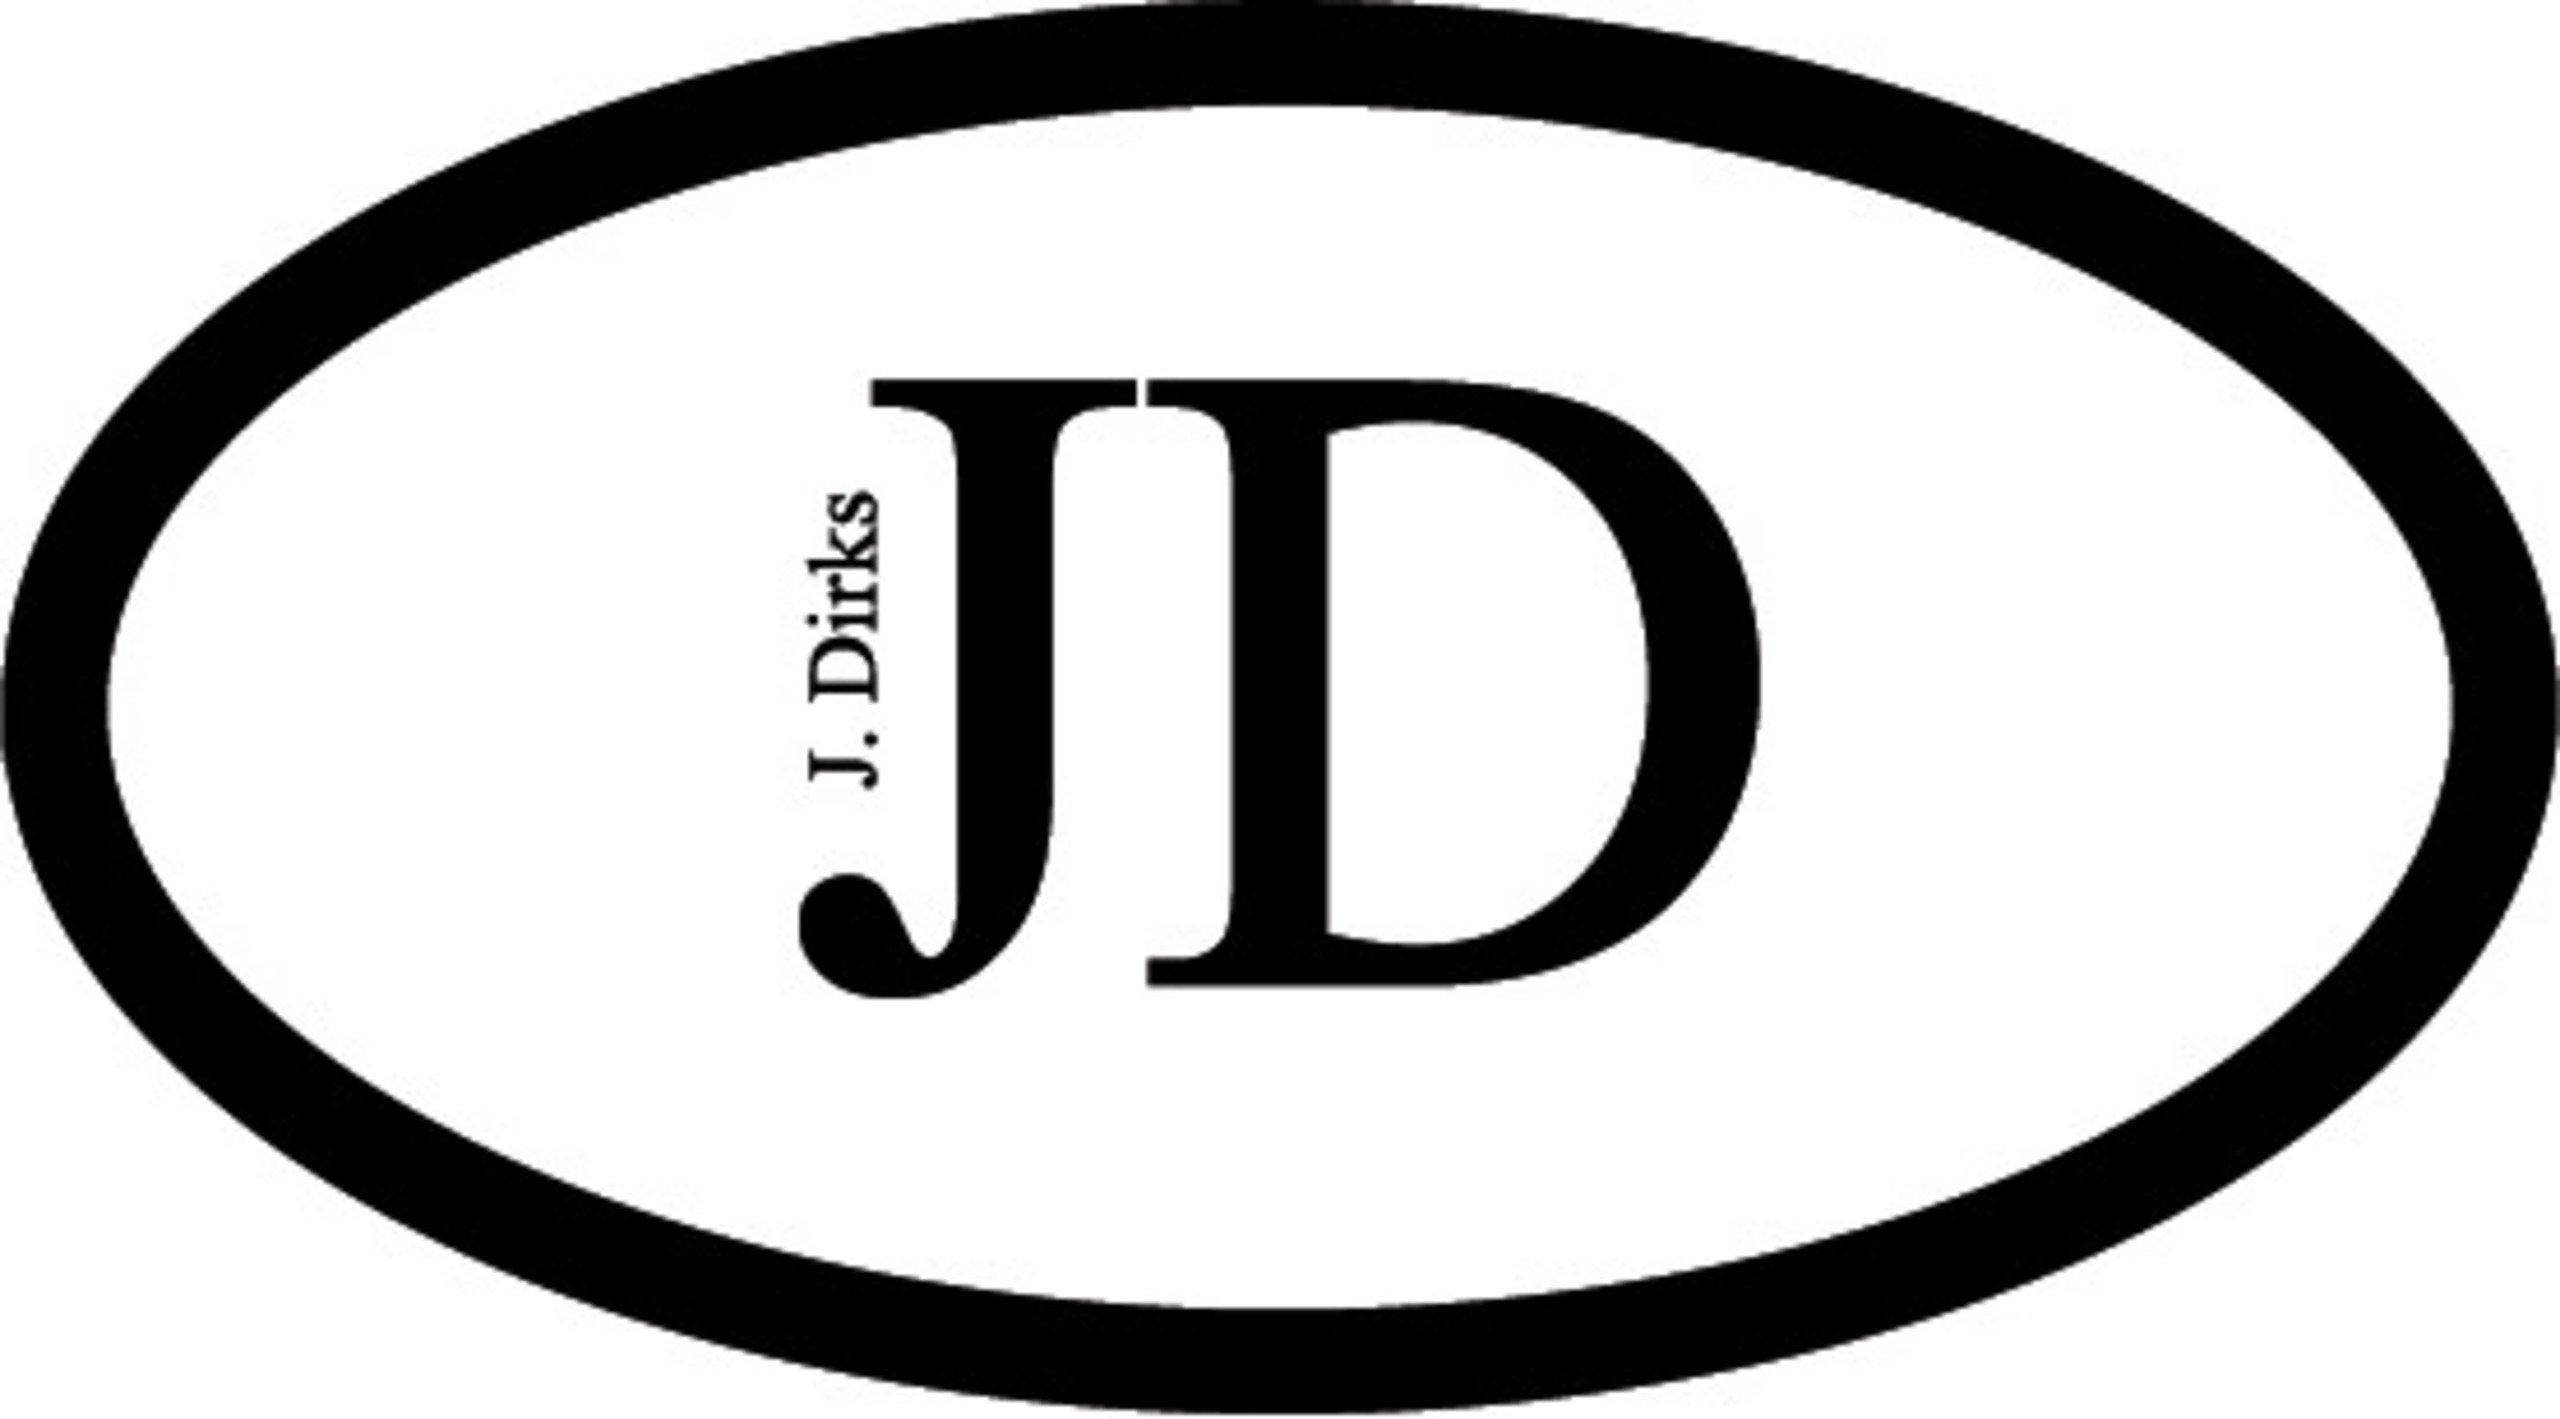 Strumpf Dirks GmbH